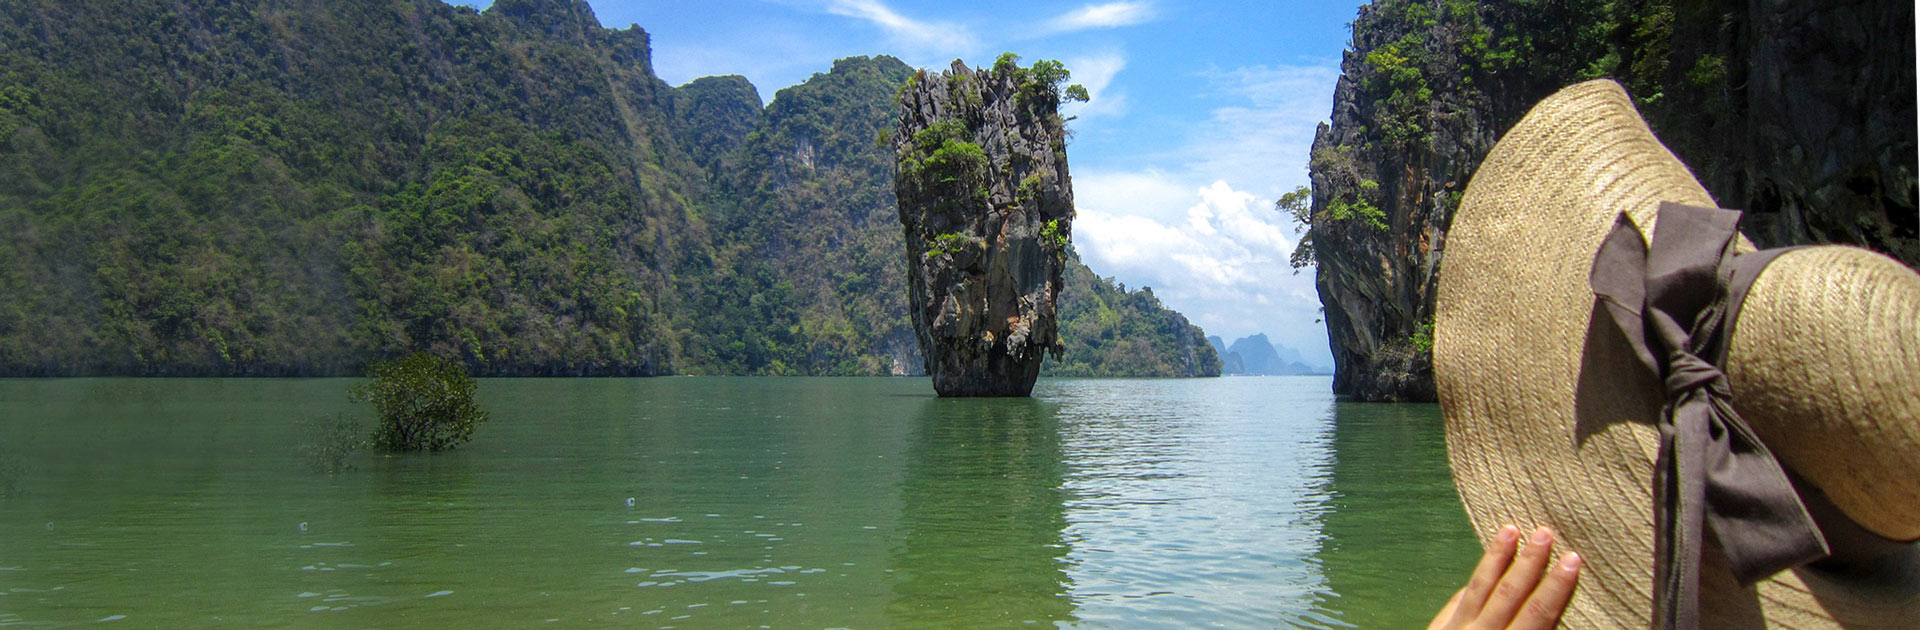 KHTH Siem Reap Triángulo de Oro y Phuket 15 días 3